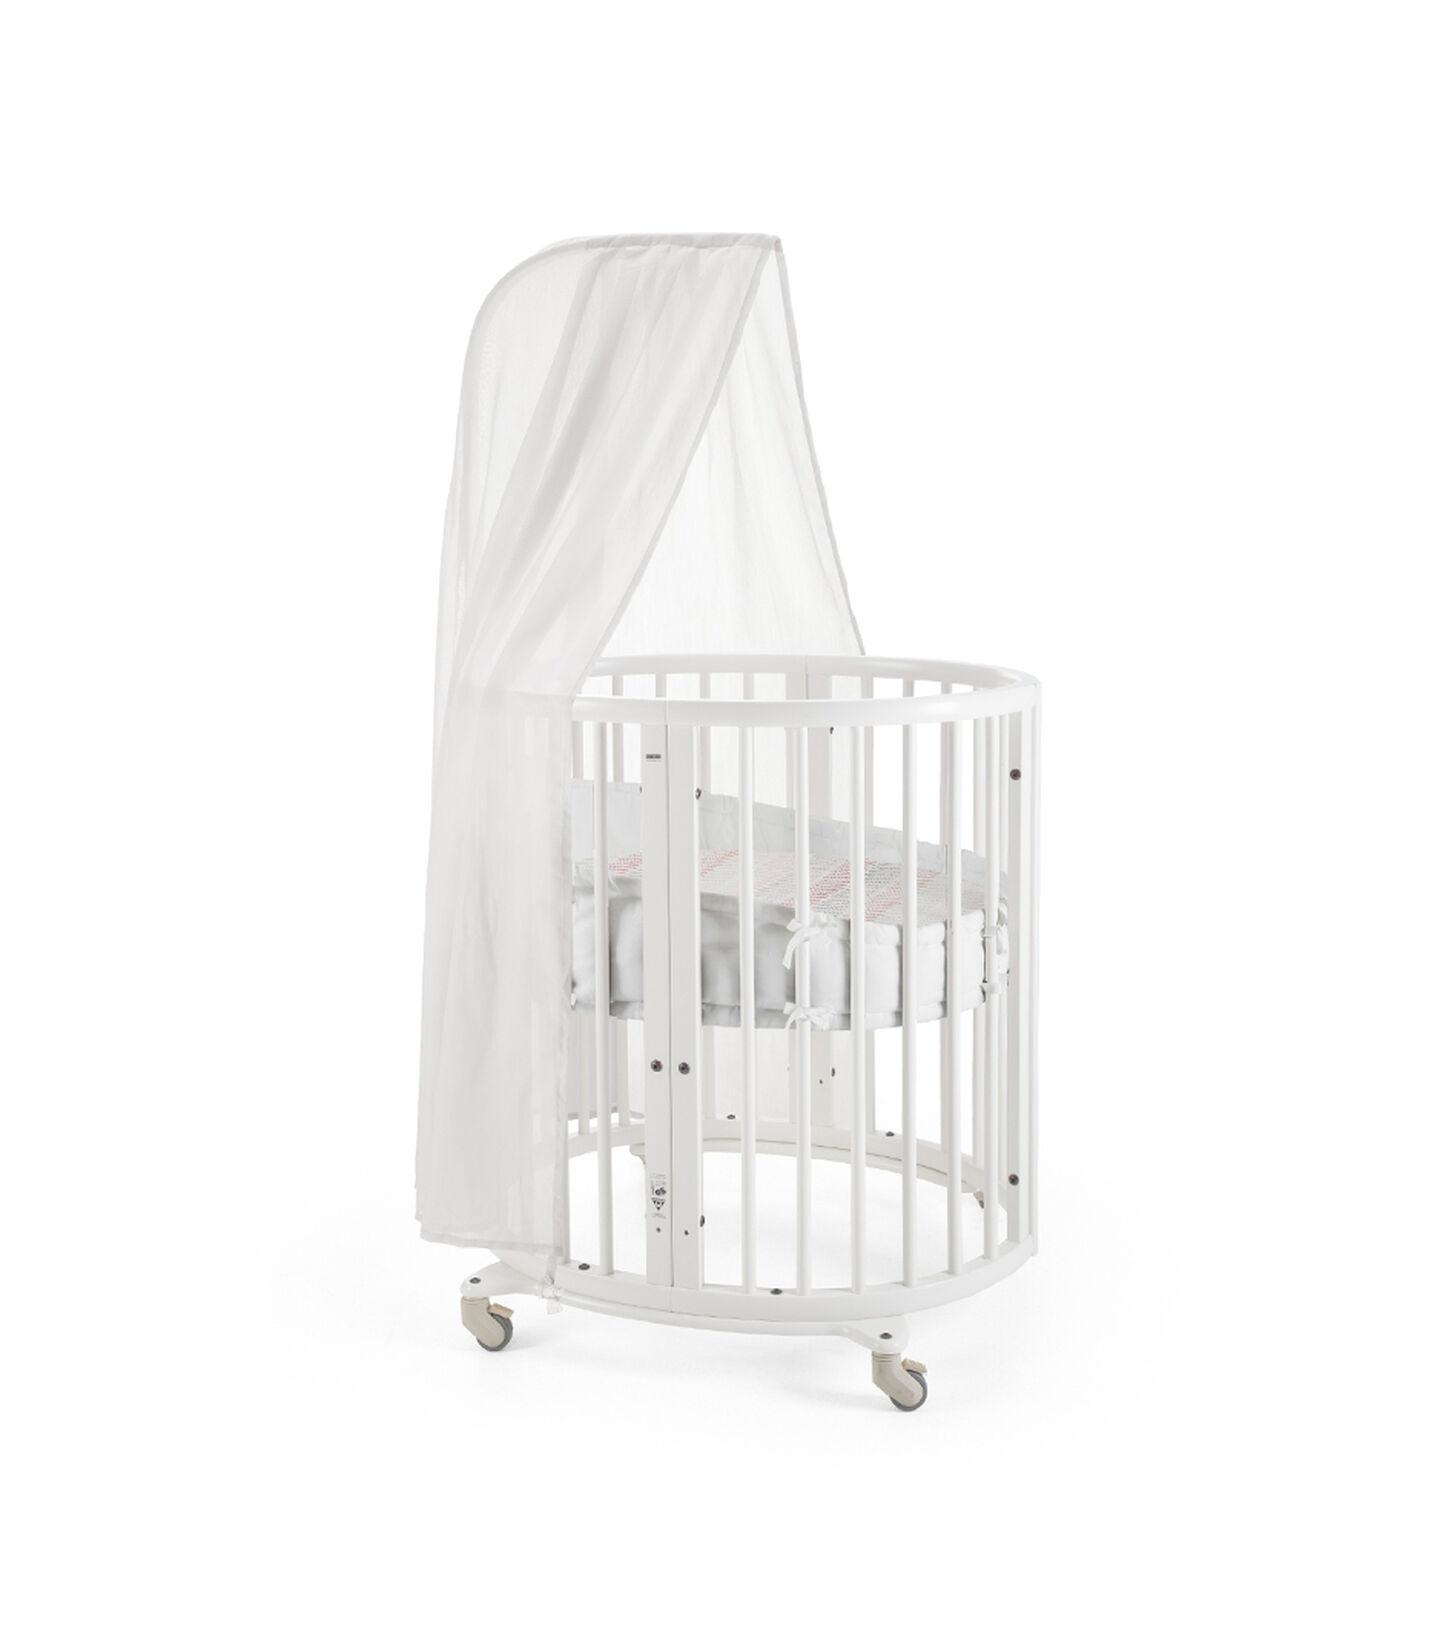 Stokke® Sleepi™ Canopy White, White, mainview view 1